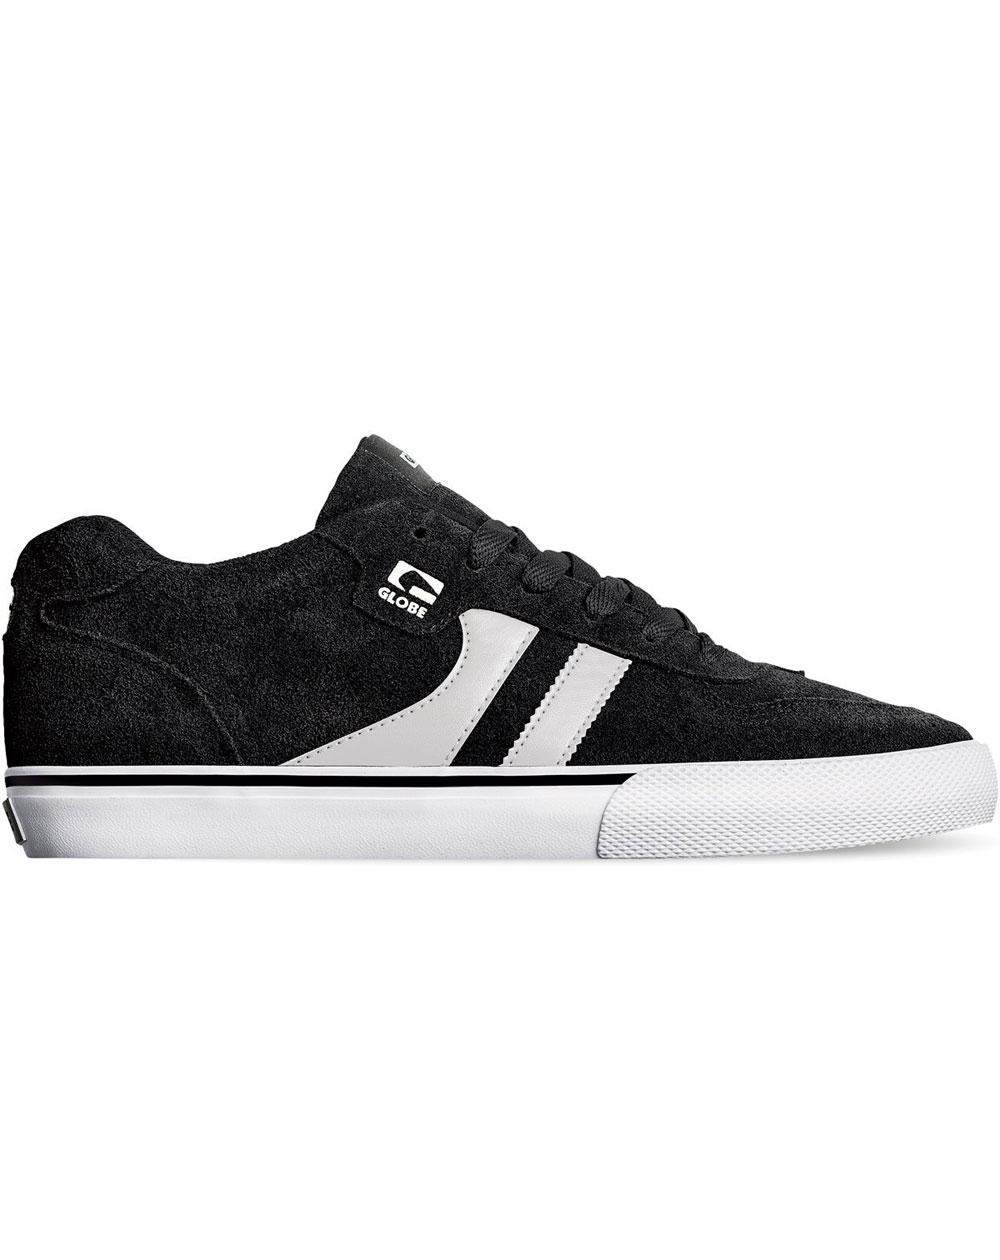 Globe Men's Sneakers Shoes Encore-2 Black/Light Grey